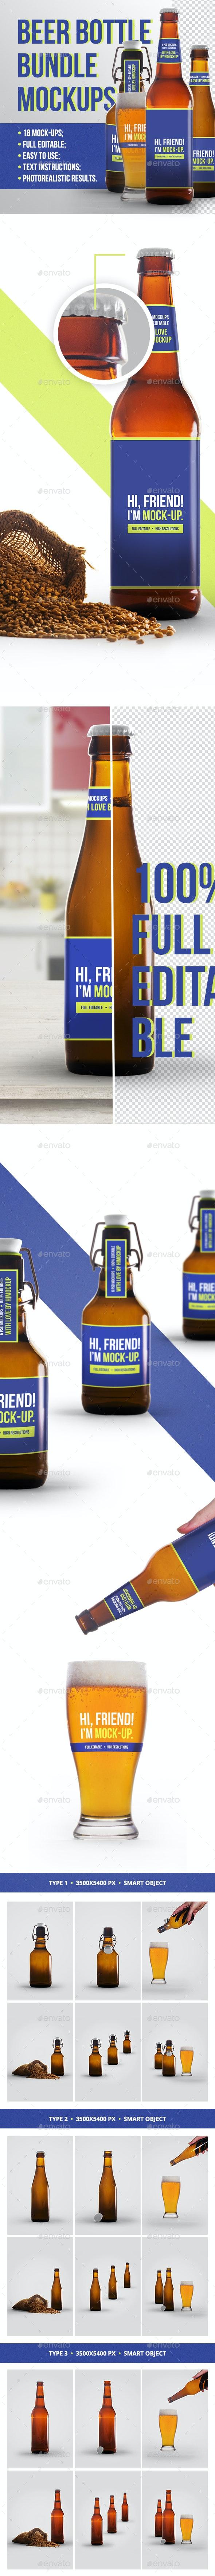 Beer Bottle Mockup Bundle - Food and Drink Packaging